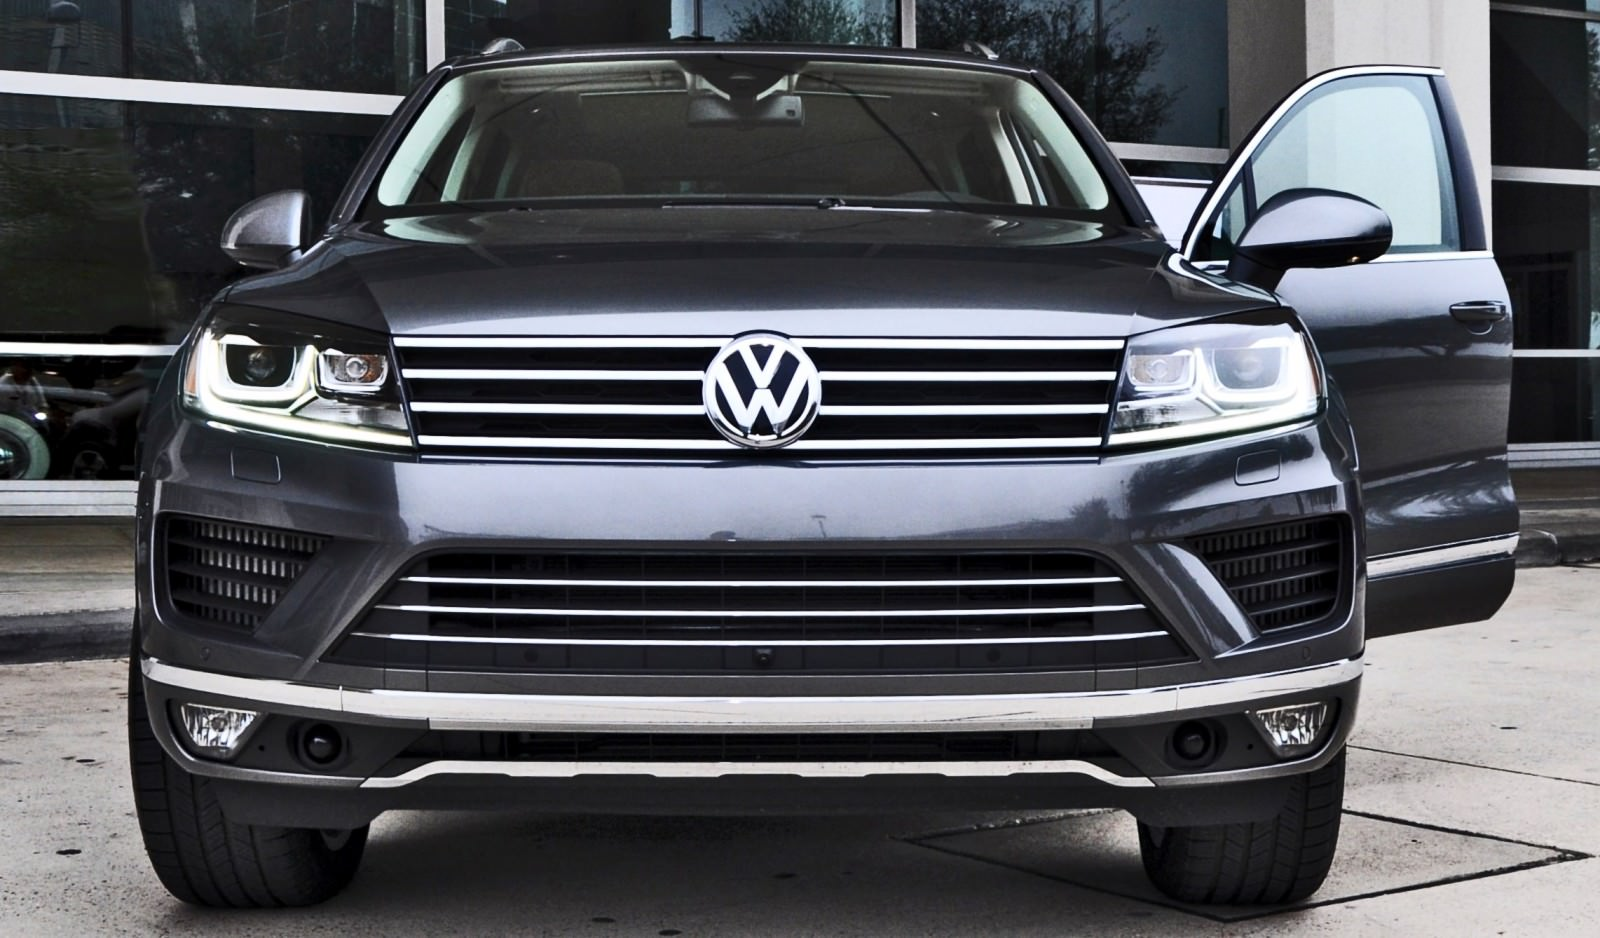 2015 Volkswagen Touareg TDI 29